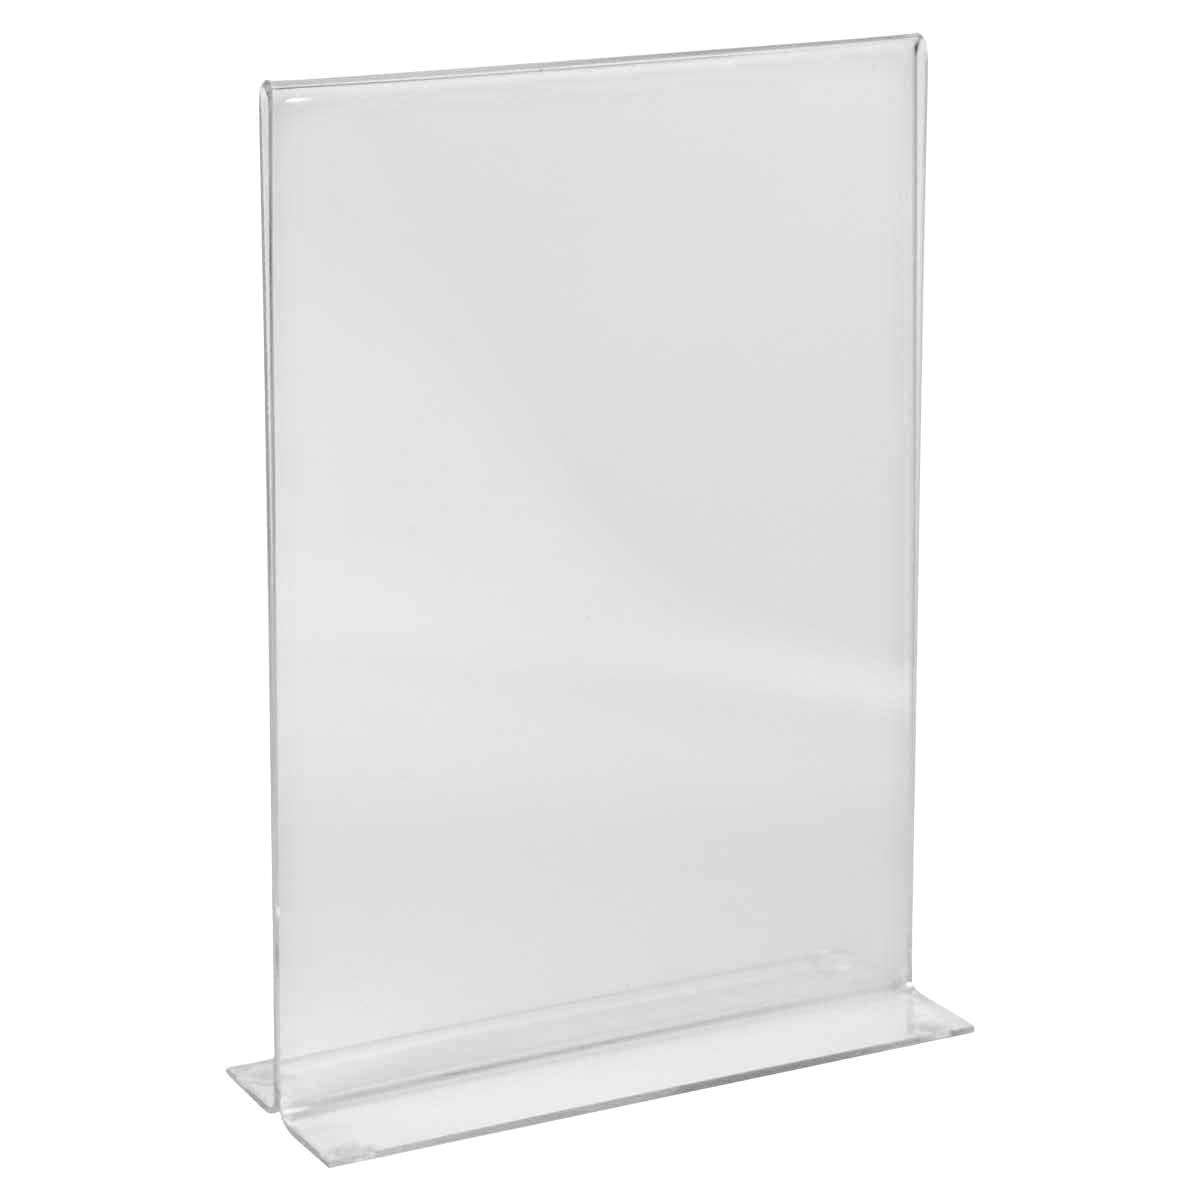 Suport meniu din plastic transparent pentru birou A5, JJ DISPLAYS, 148 x 210 mm, Landscape